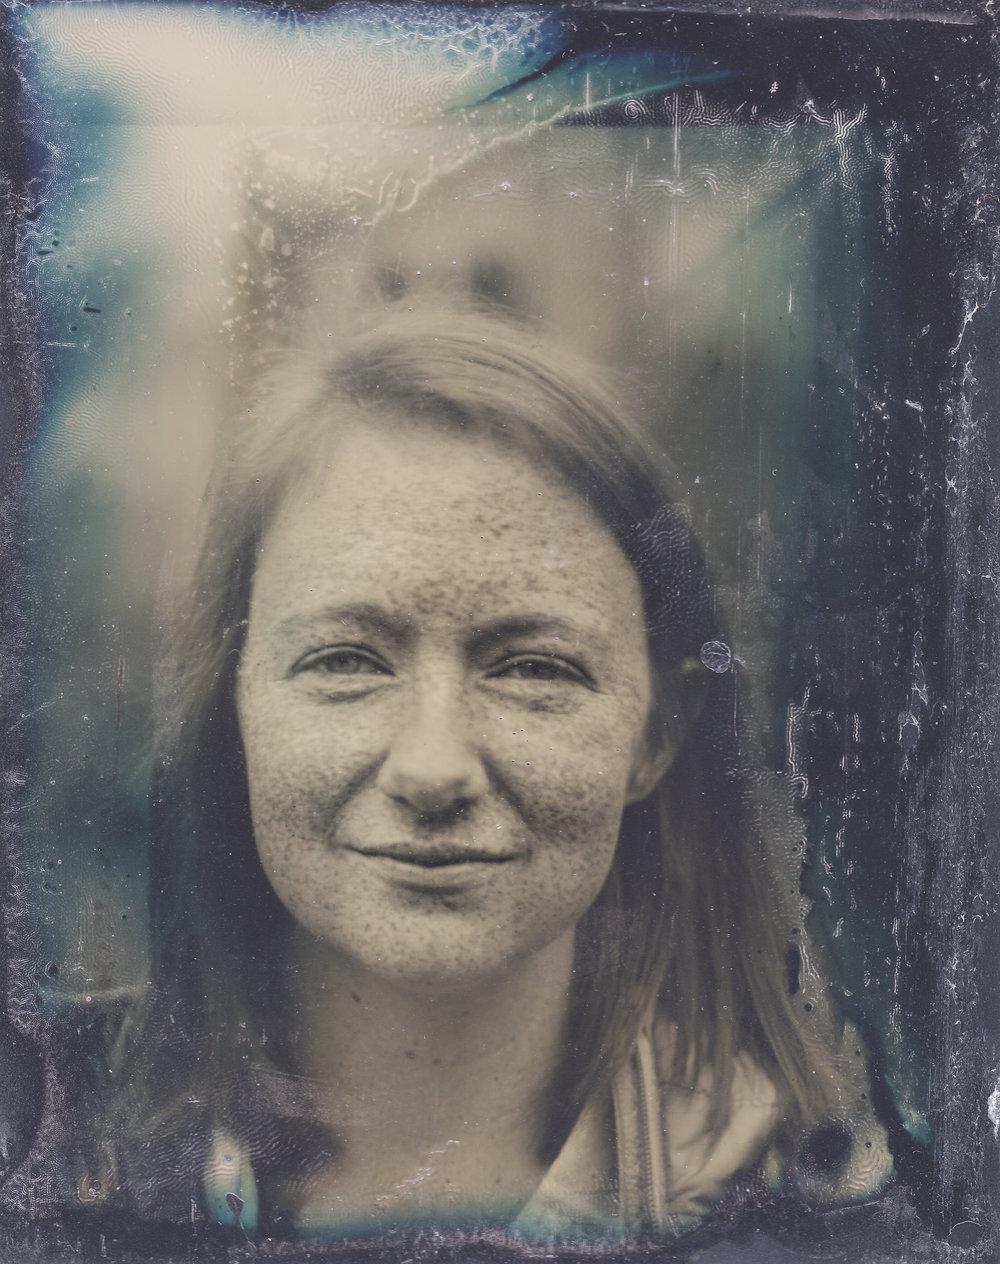 Modern Tintype portrait photographer Steven Glynn